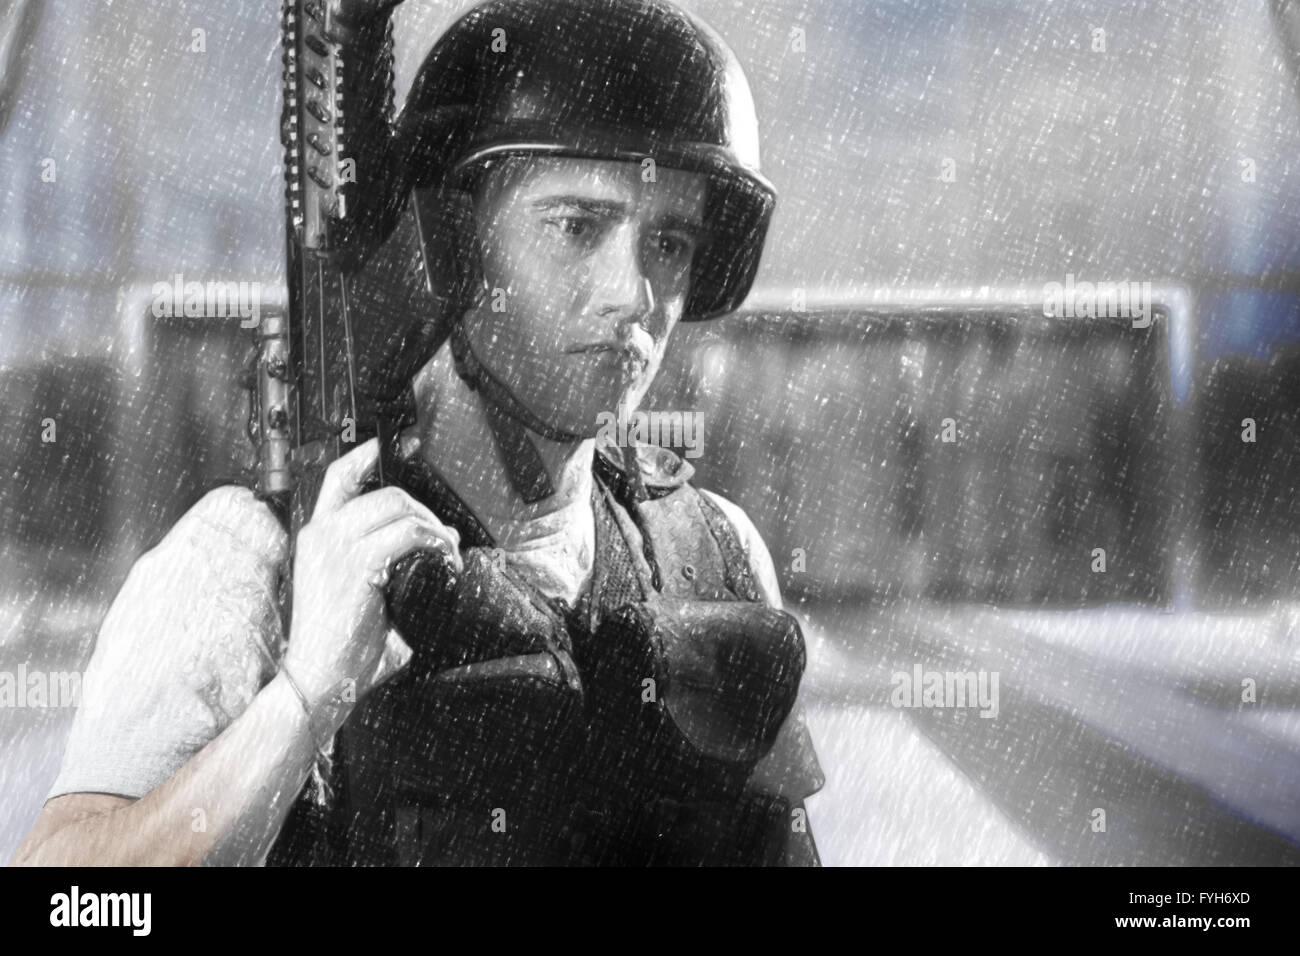 Army man illustration with machine gun - Stock Image